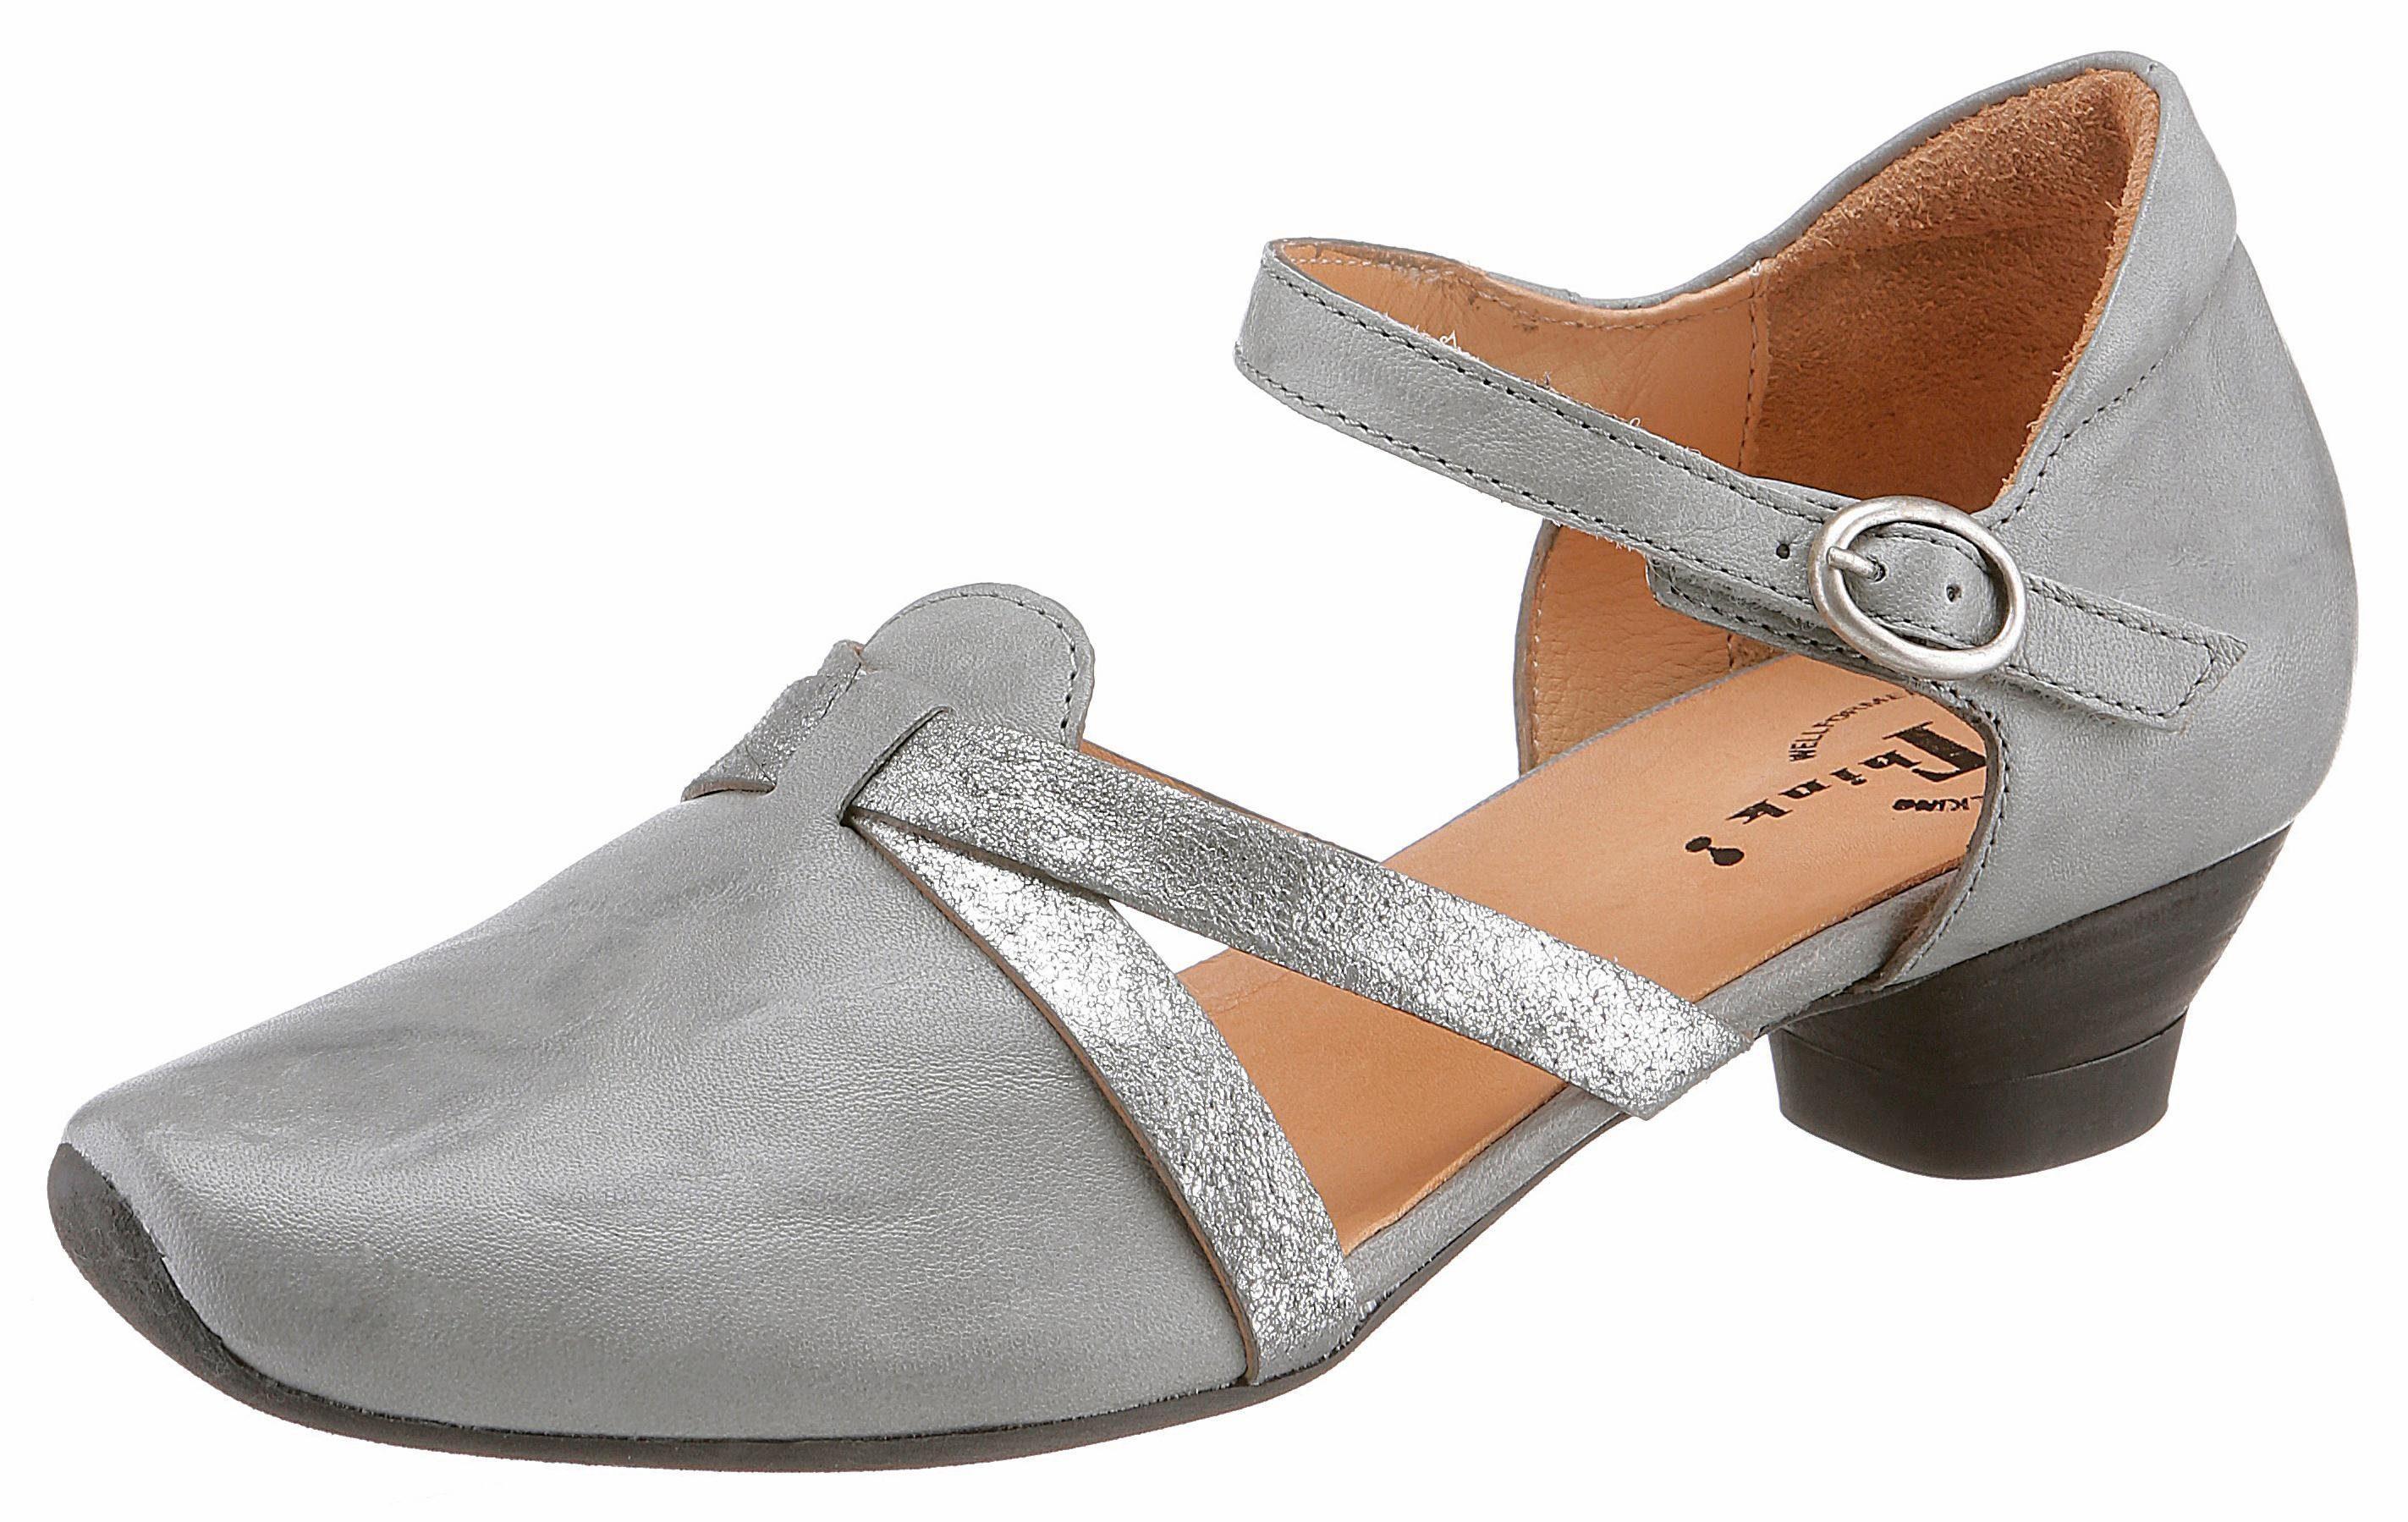 Think! Aida Spangenpumps, aus vegetabil gegerbtem Leder online kaufen  grau-metallicgrau